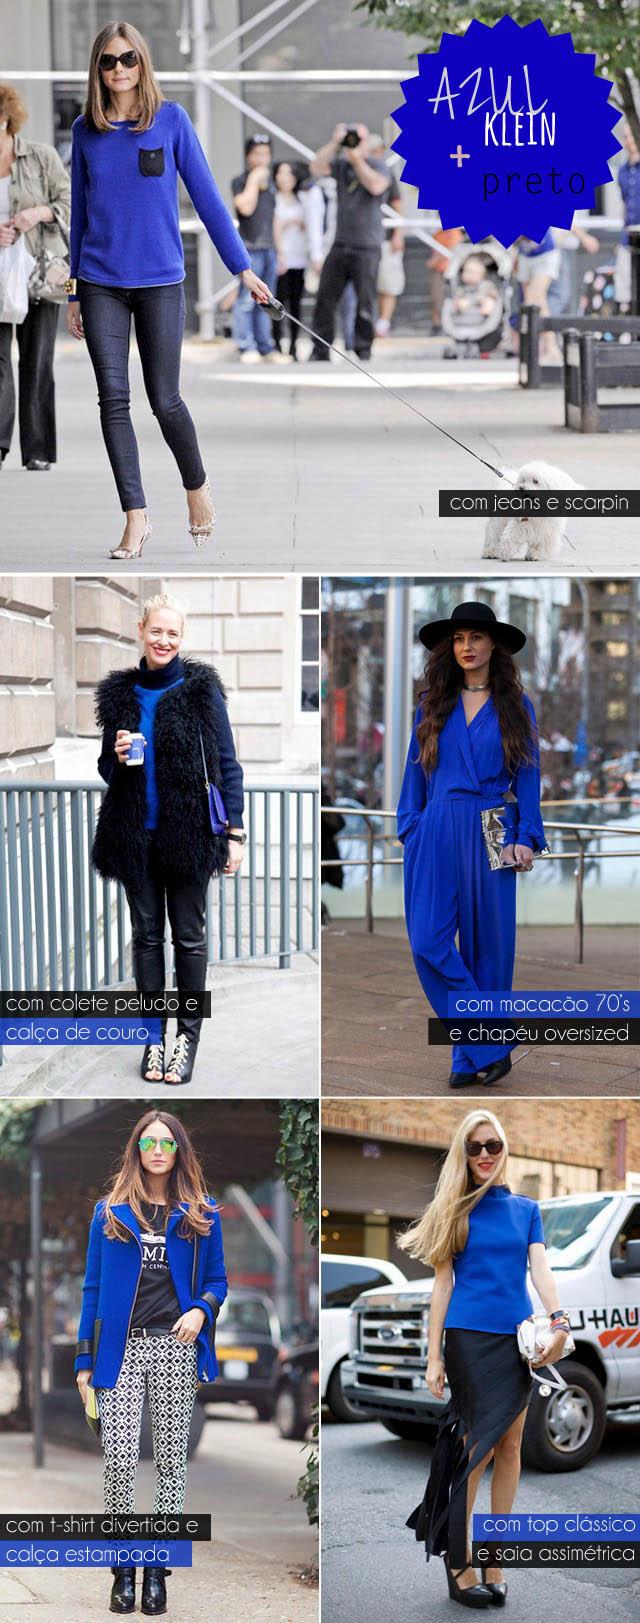 blog-da-alice-ferraz-azul-klein-e-preto (1)